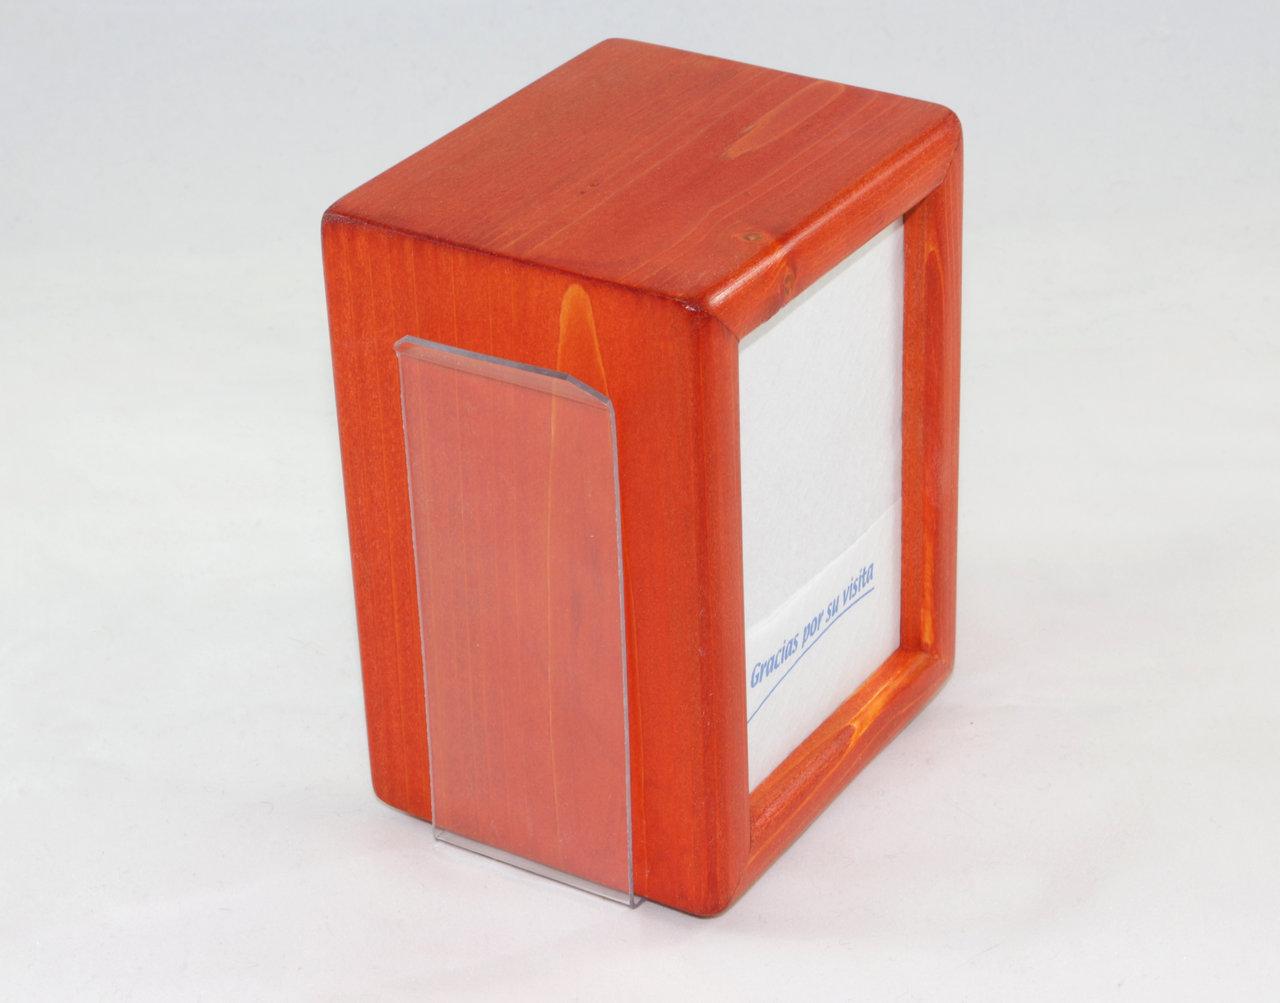 Cube napkin holder with toothpick and menu holder bh com - Wooden pocket toothpick holder ...